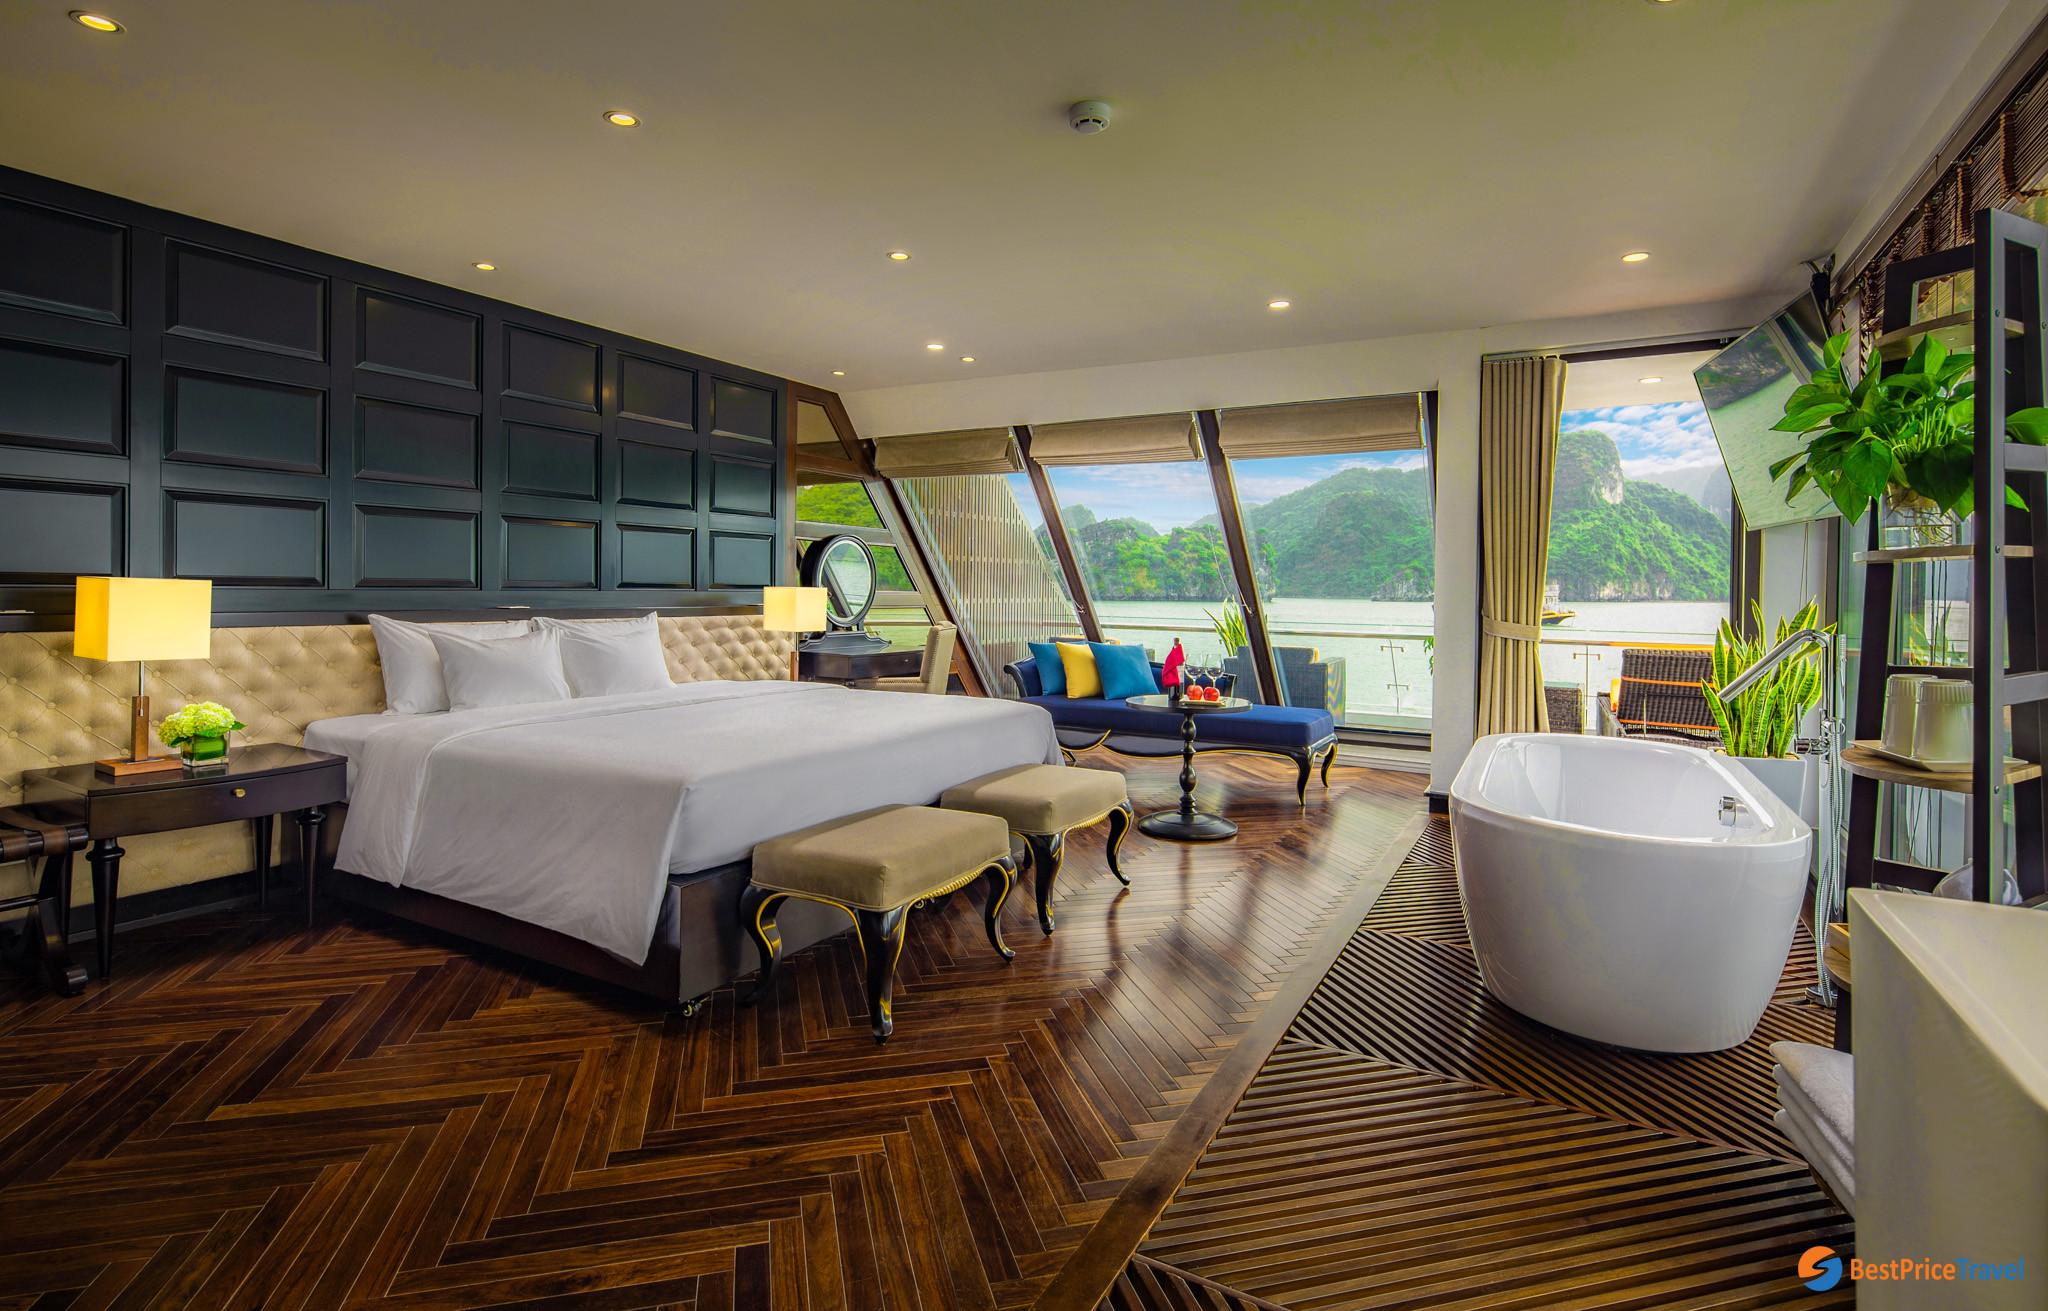 Executive Suite -  Stellar of the sea cruise